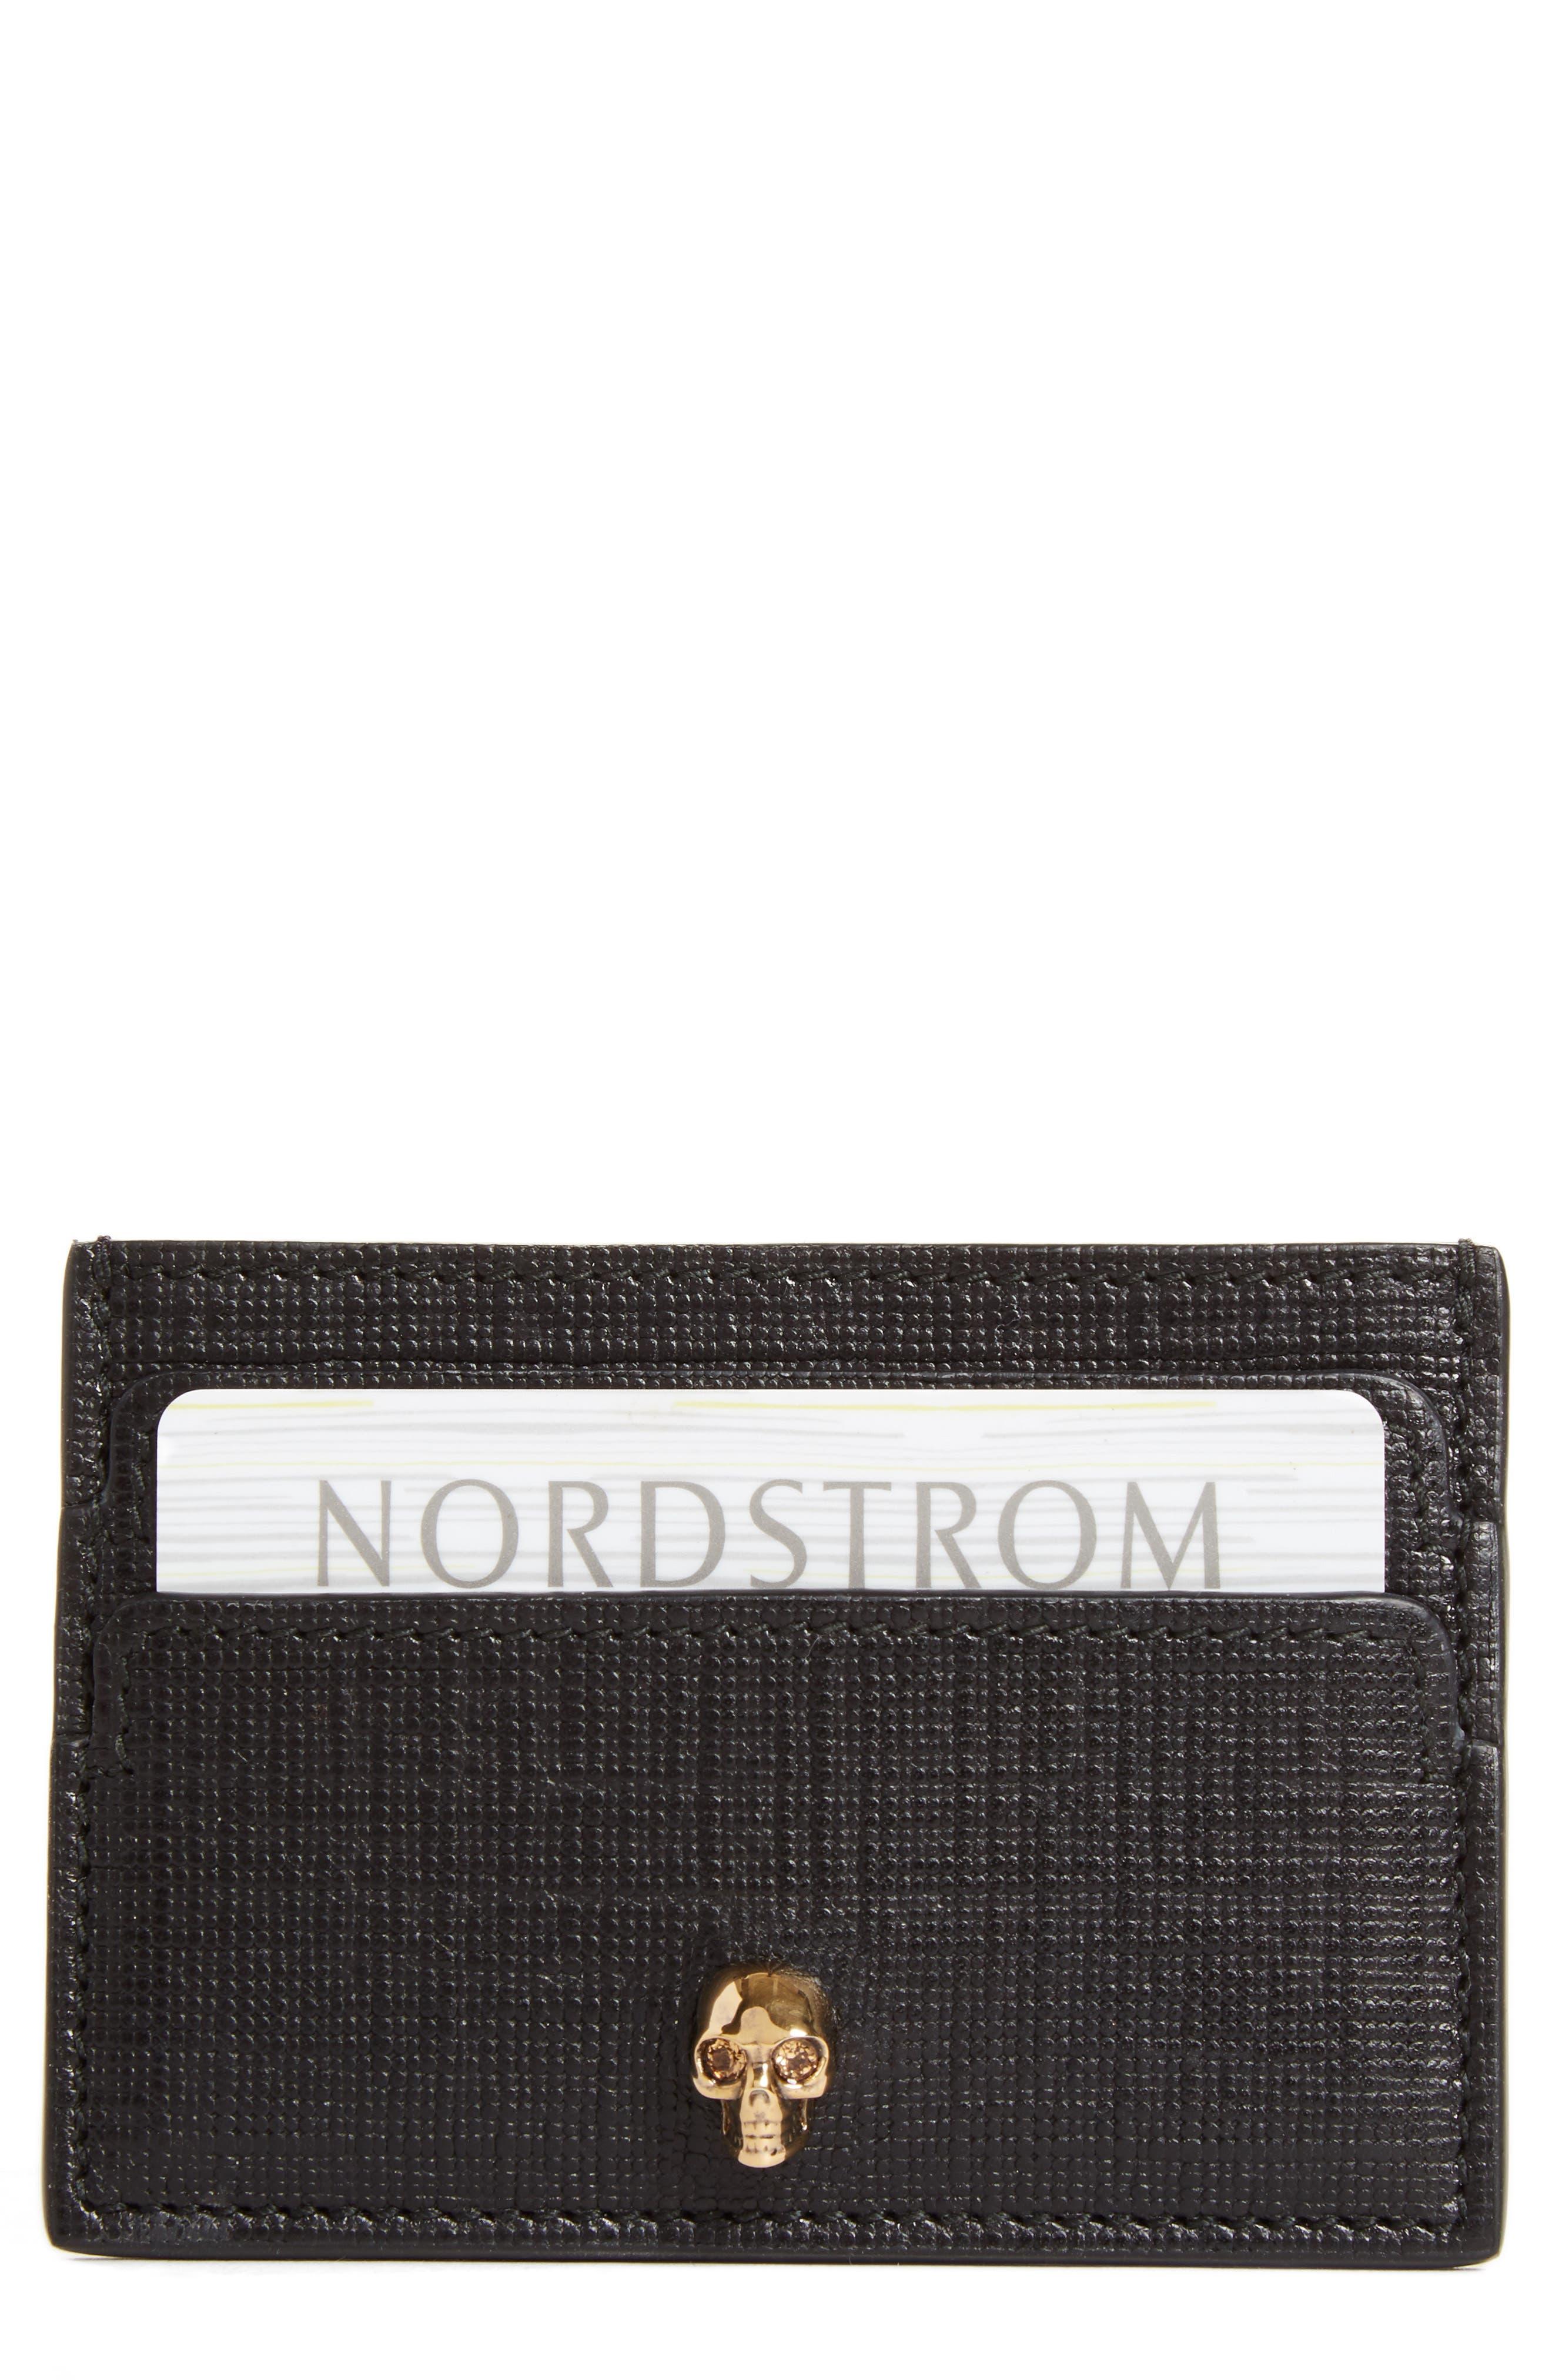 Alexander McQueen Embossed Calfskin Leather Card Holder